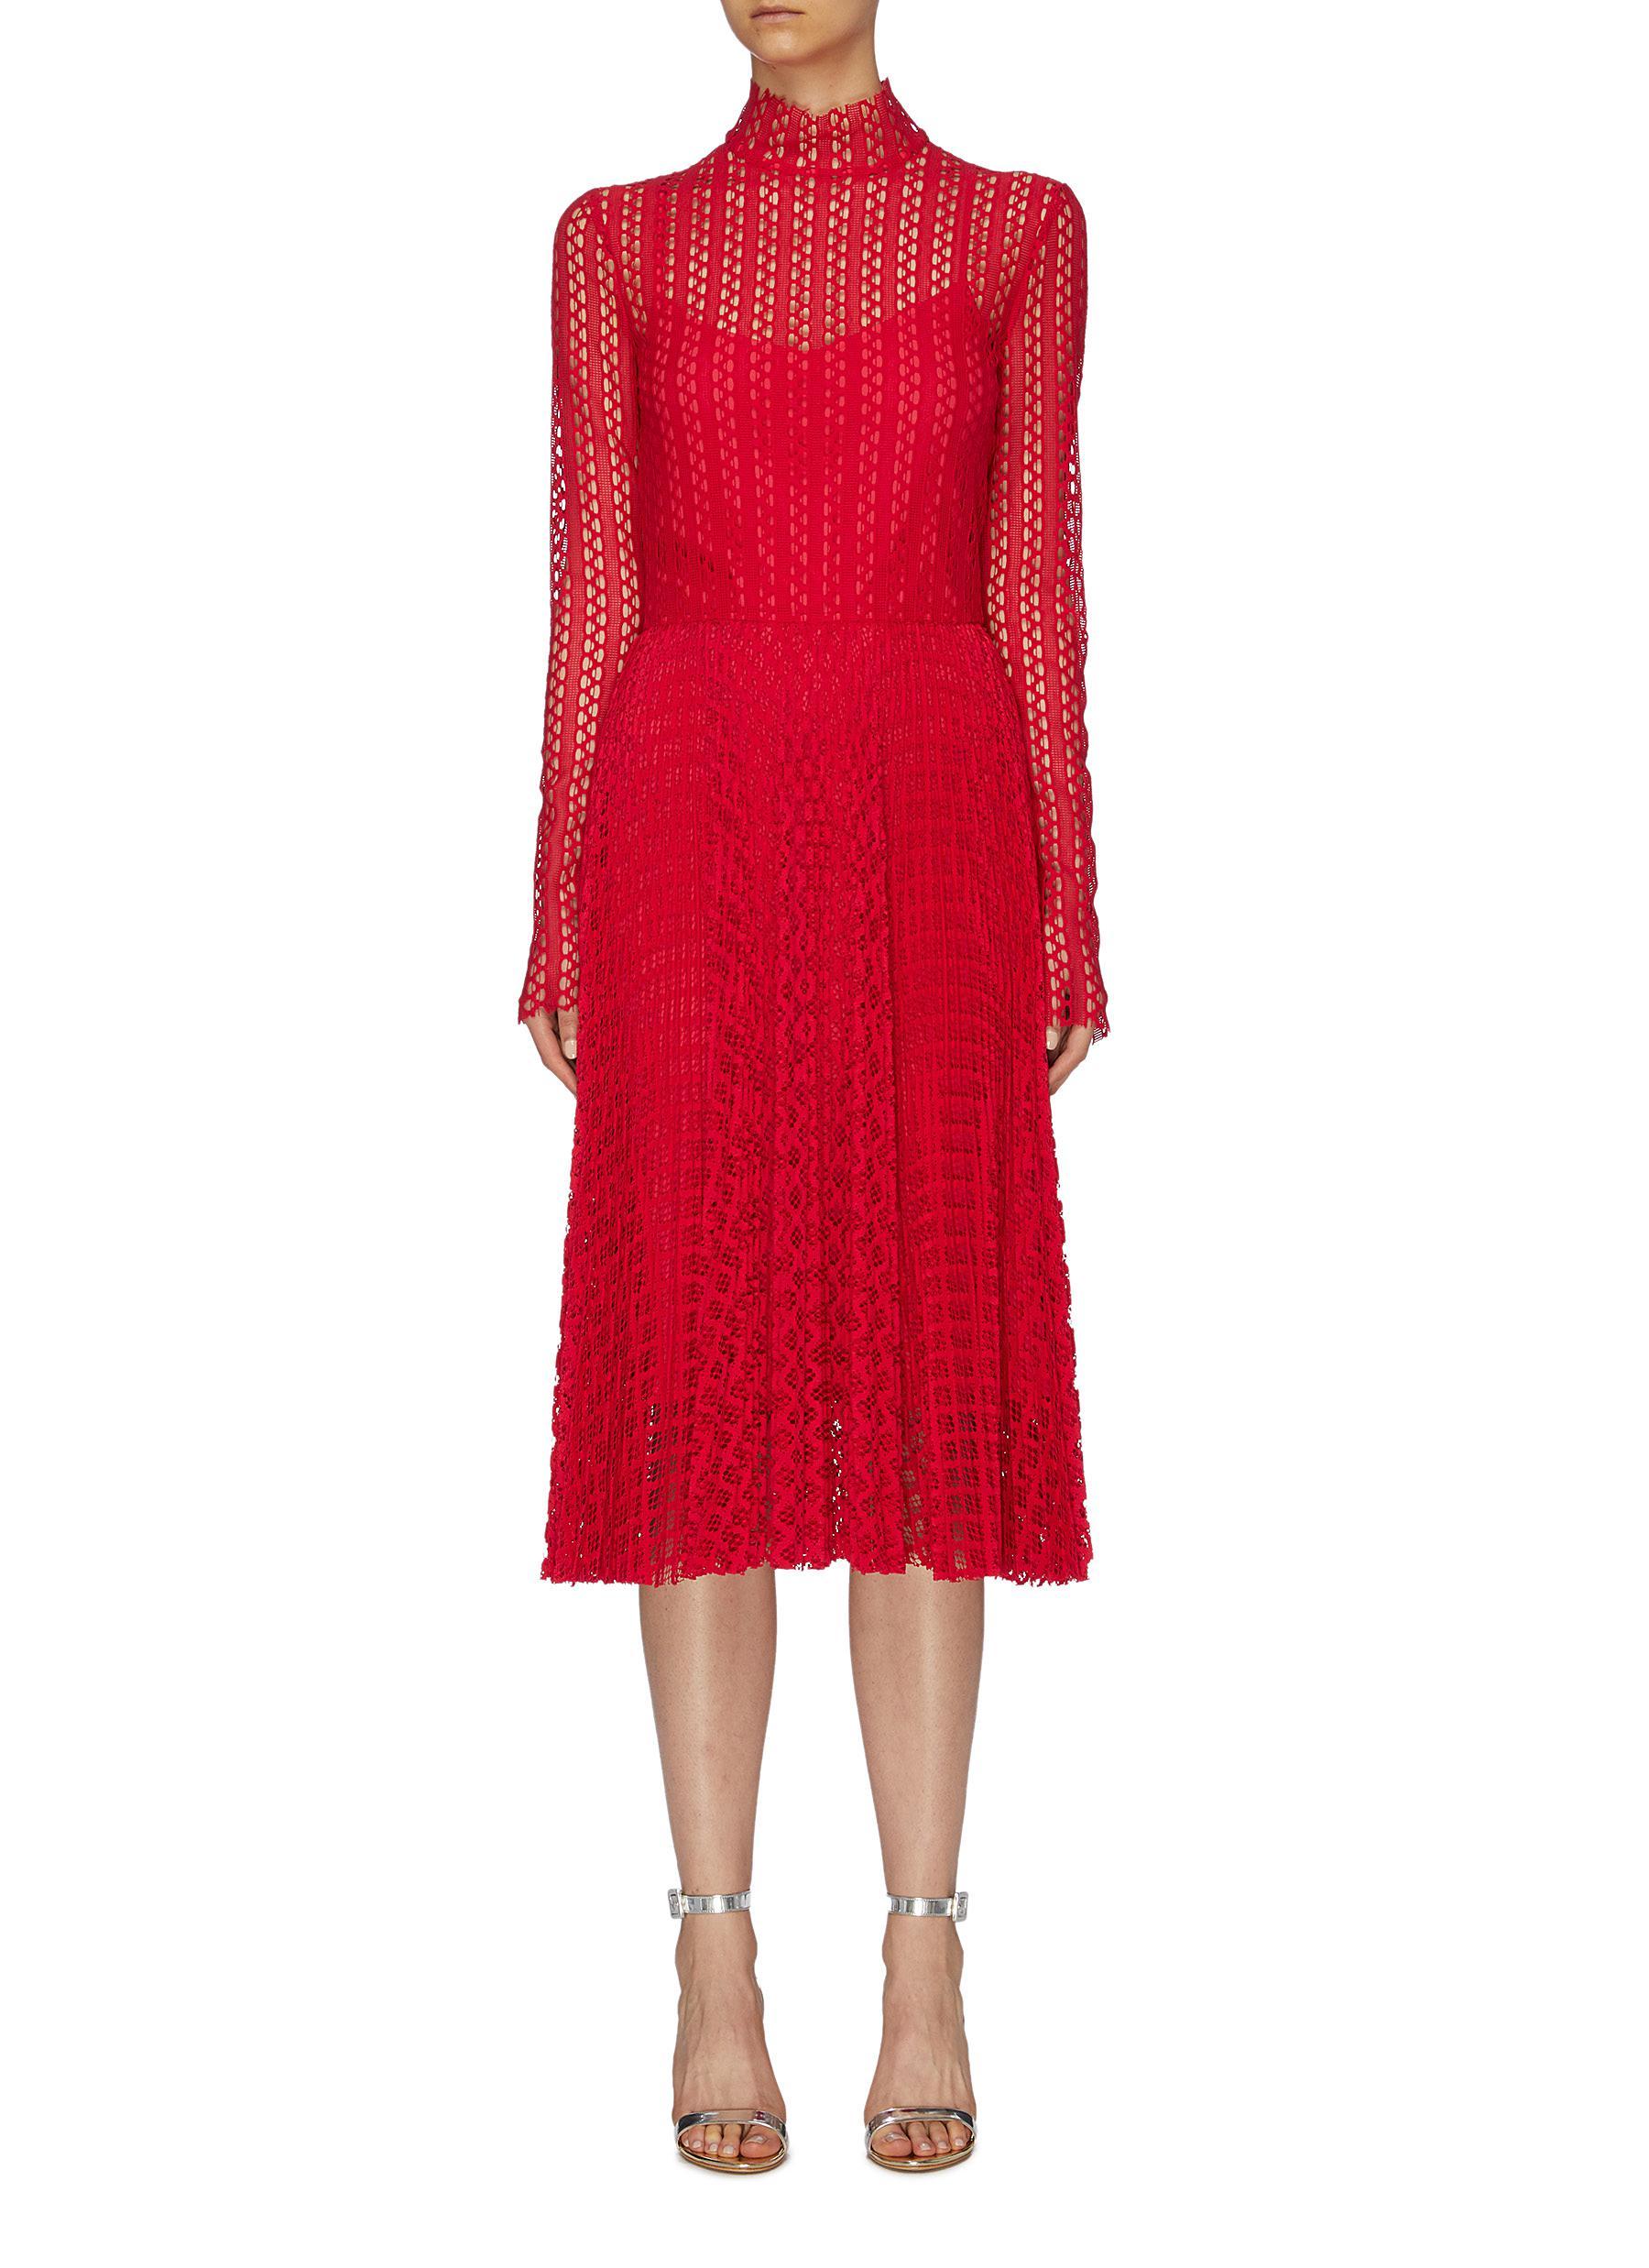 Pleated geometric lace high neck dress by Philosophy Di Lorenzo Serafini